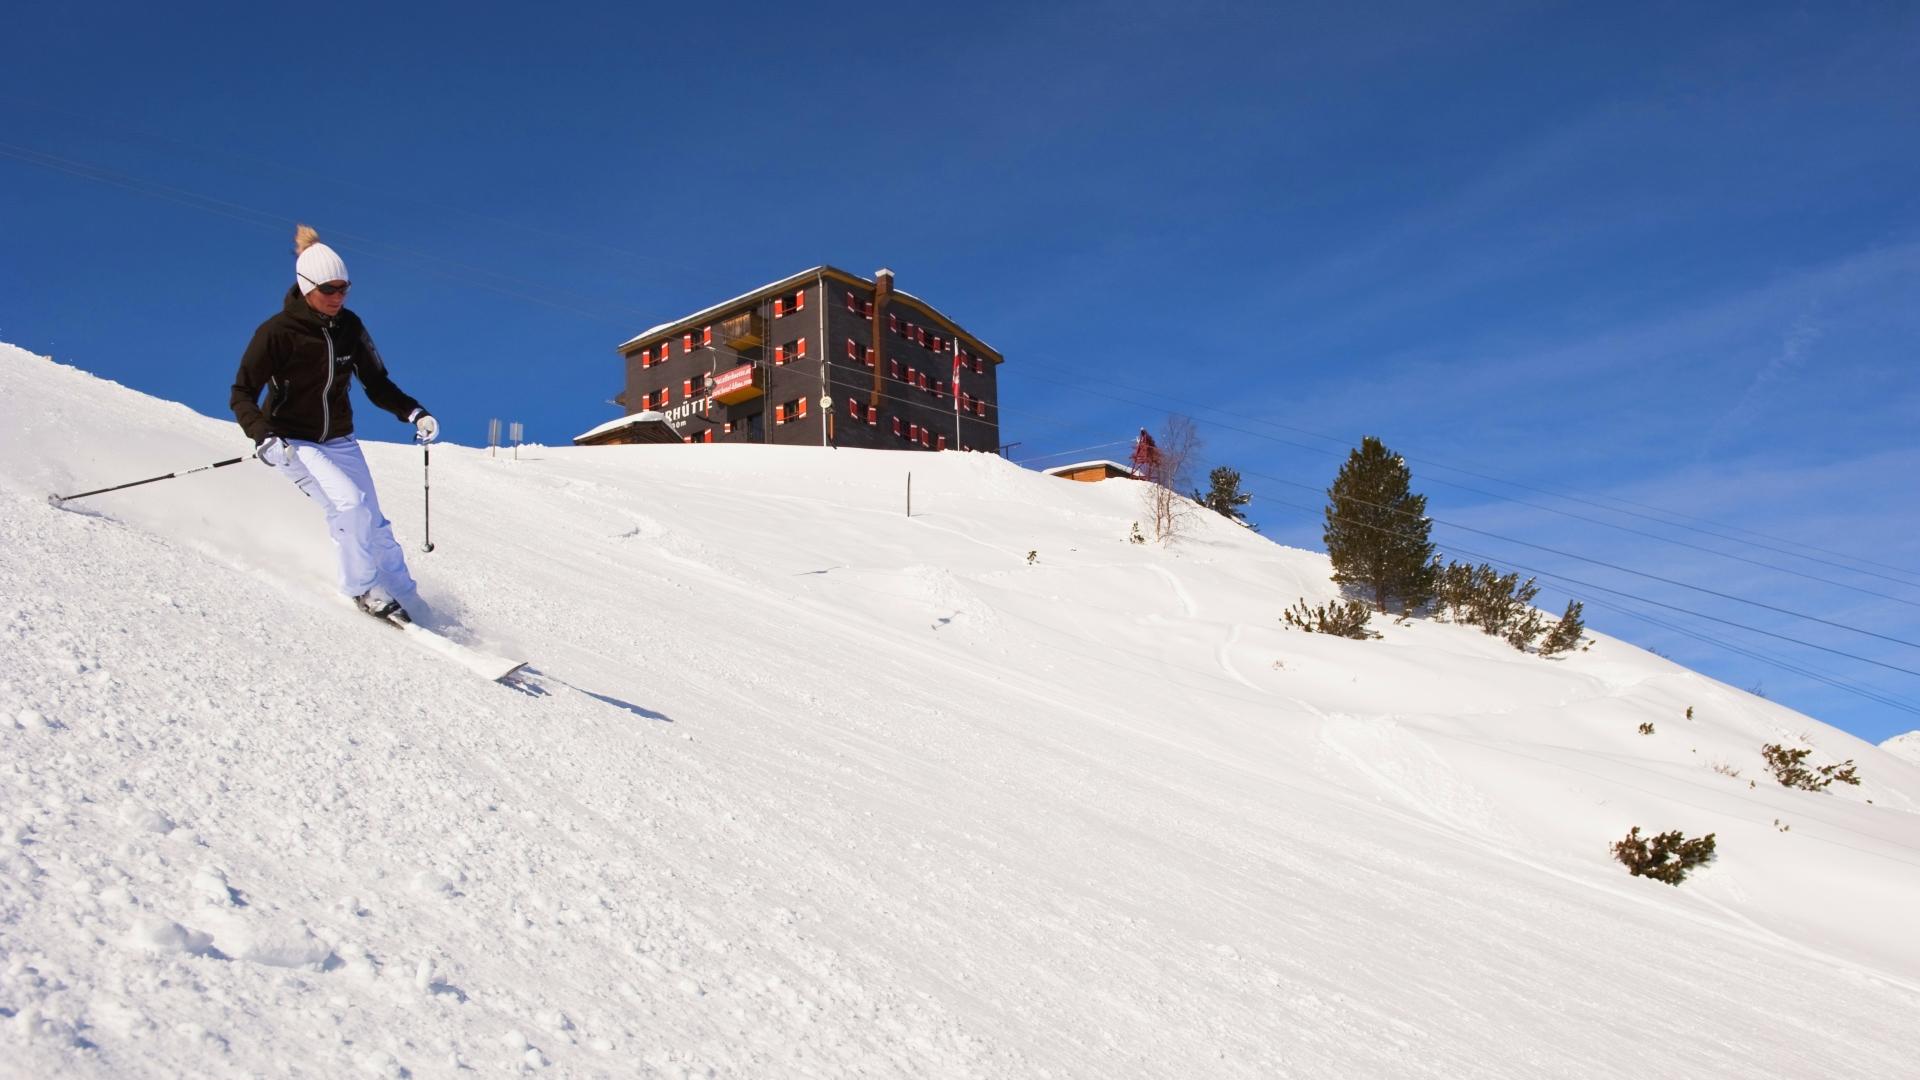 Ski slope on Elfer